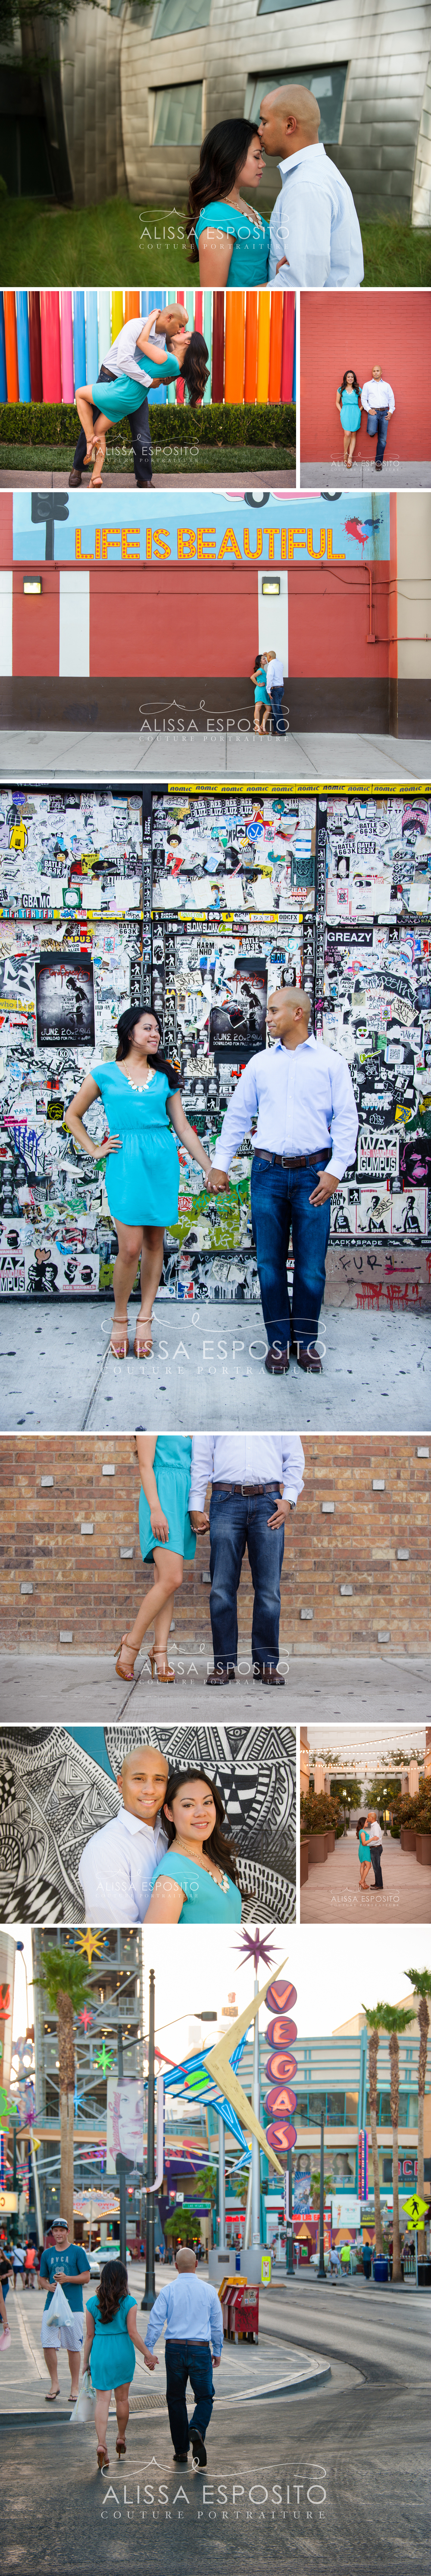 Las Vegas Engagement Wedding Portrait Photographer | Alissa Esposito Photography | www.alissaesposito.com